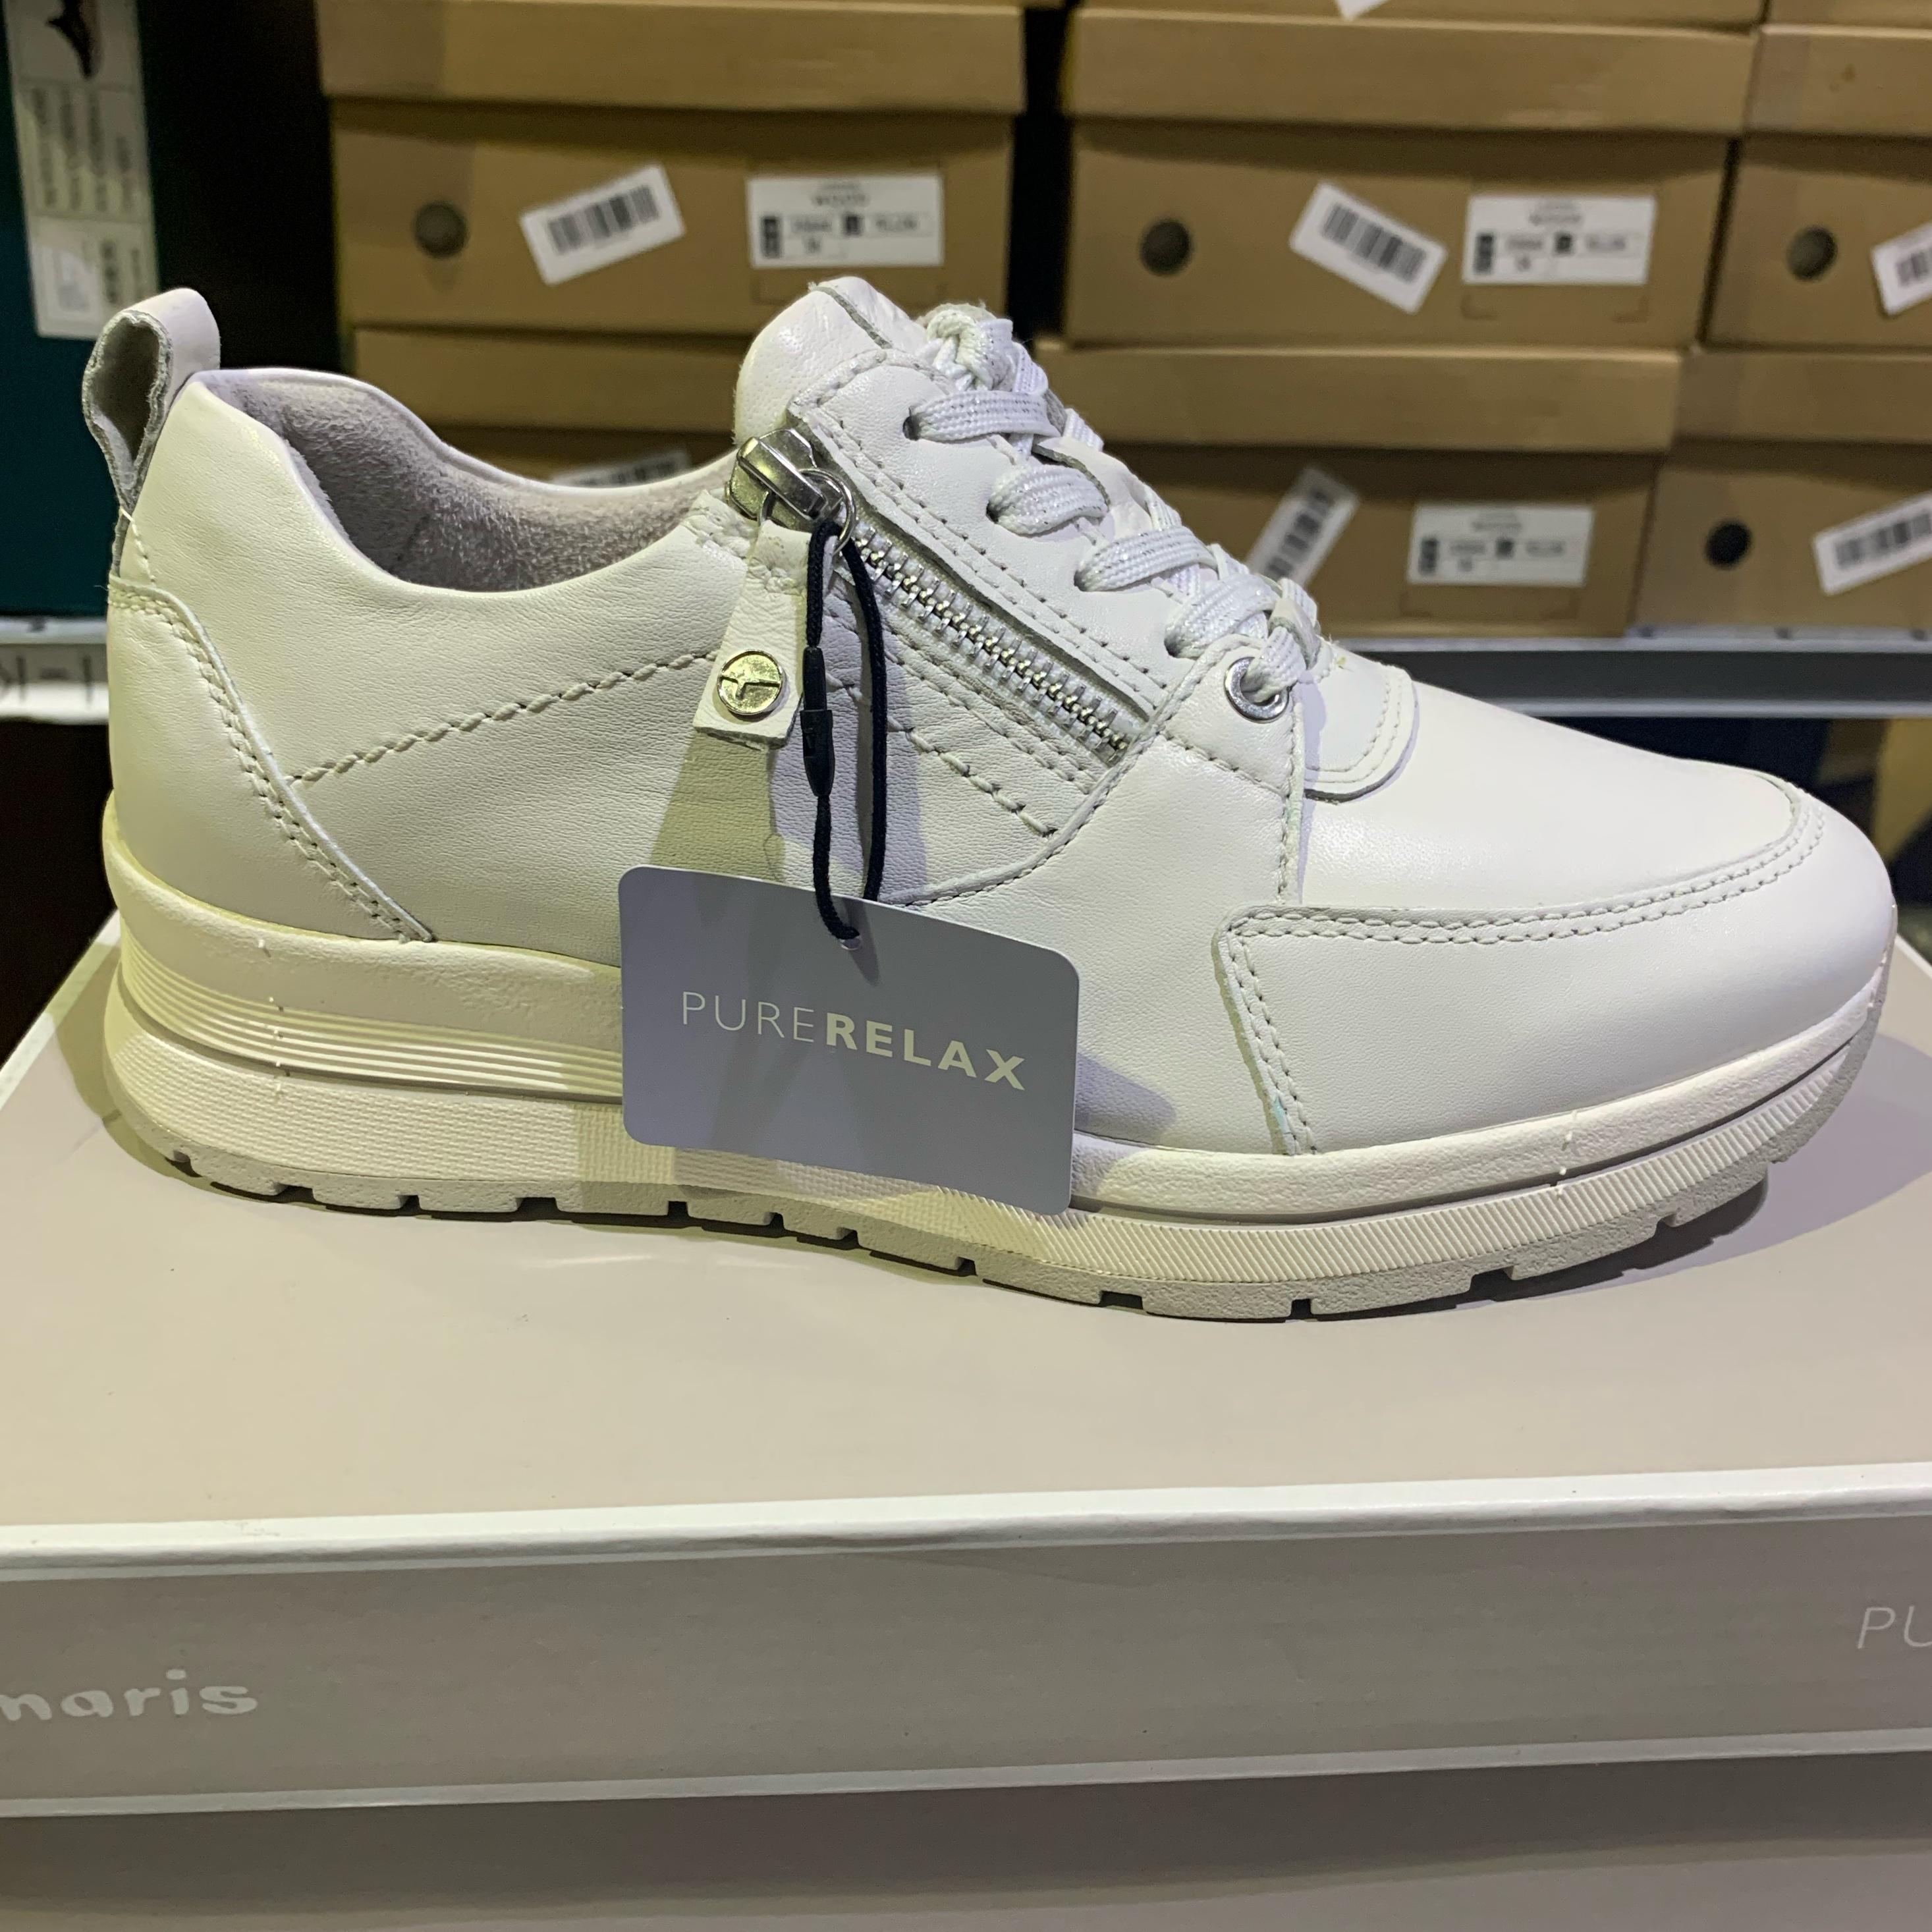 tamaris uni white leather sneakers dame sommesko1